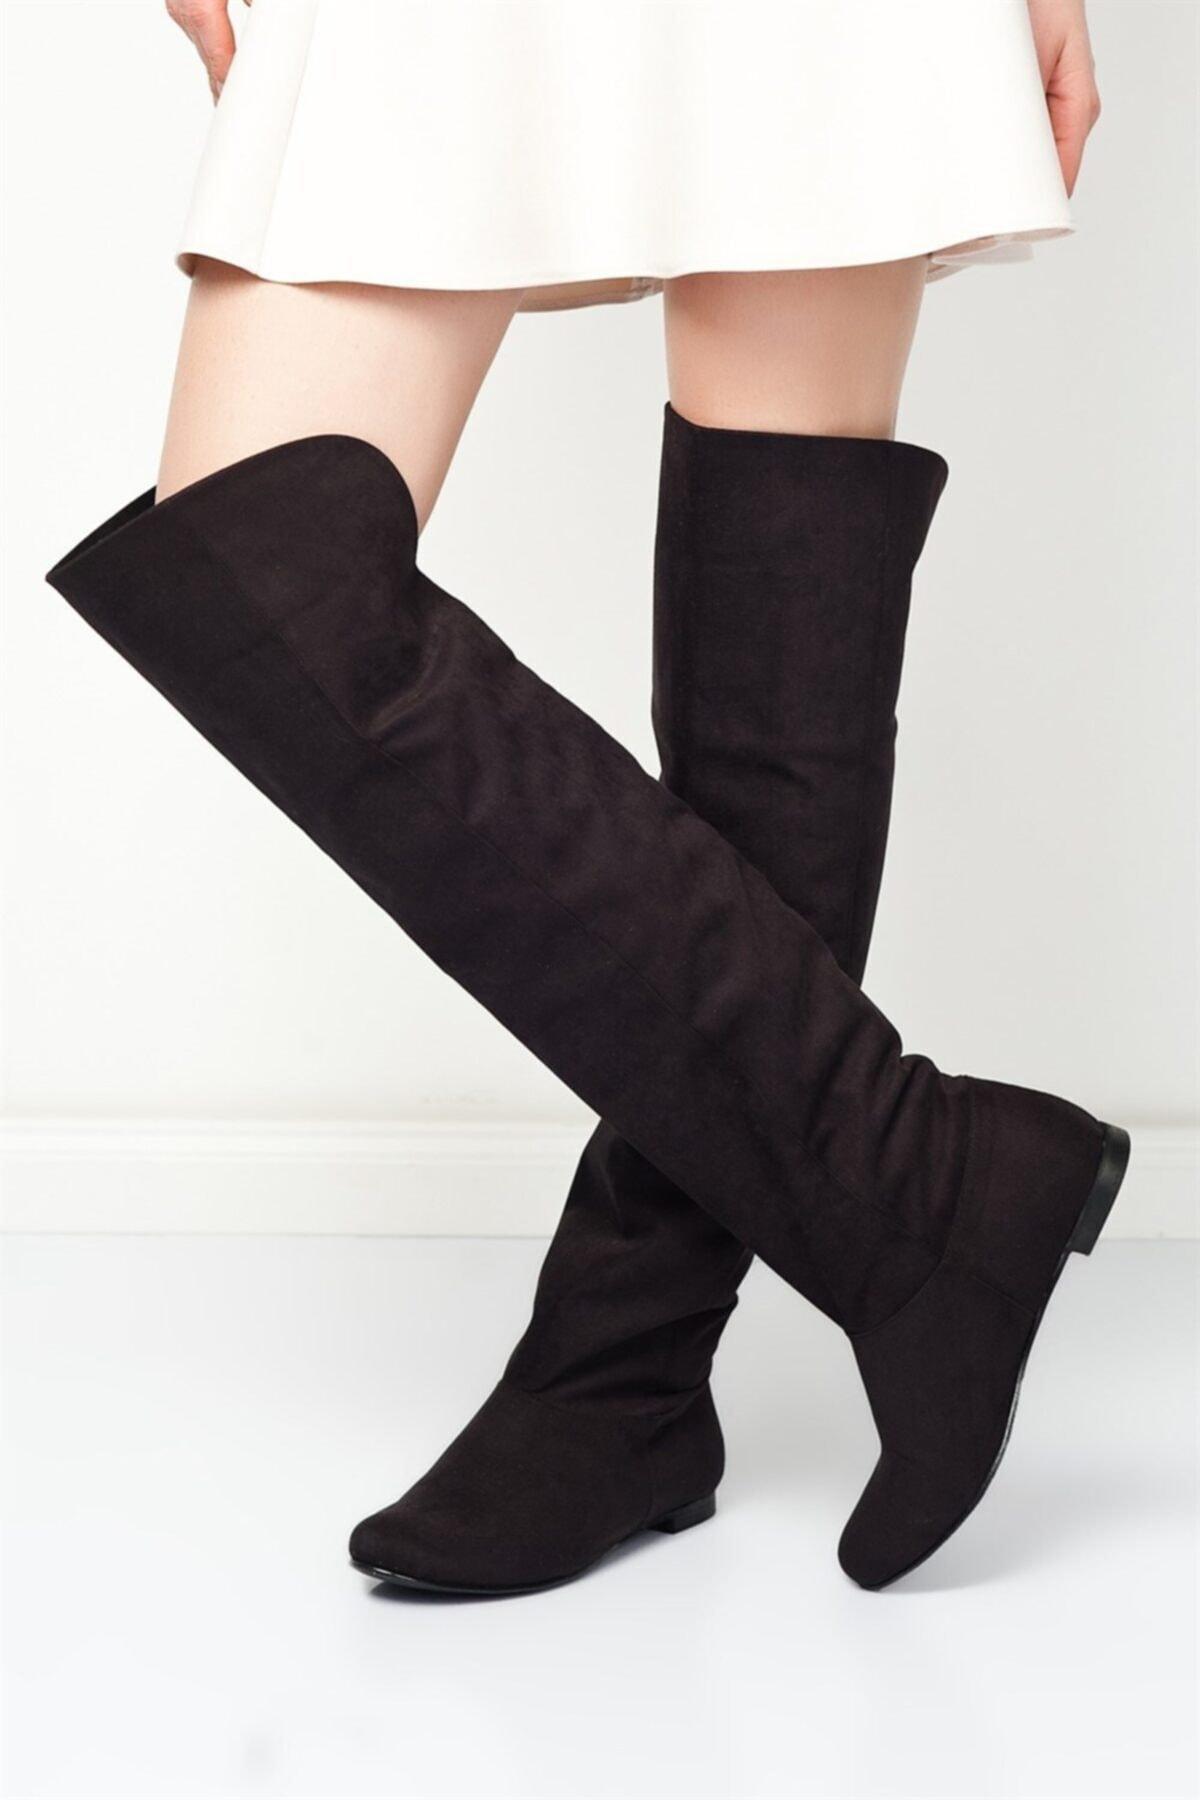 Fox Shoes Siyah Kadın Çizme 8248025902 1